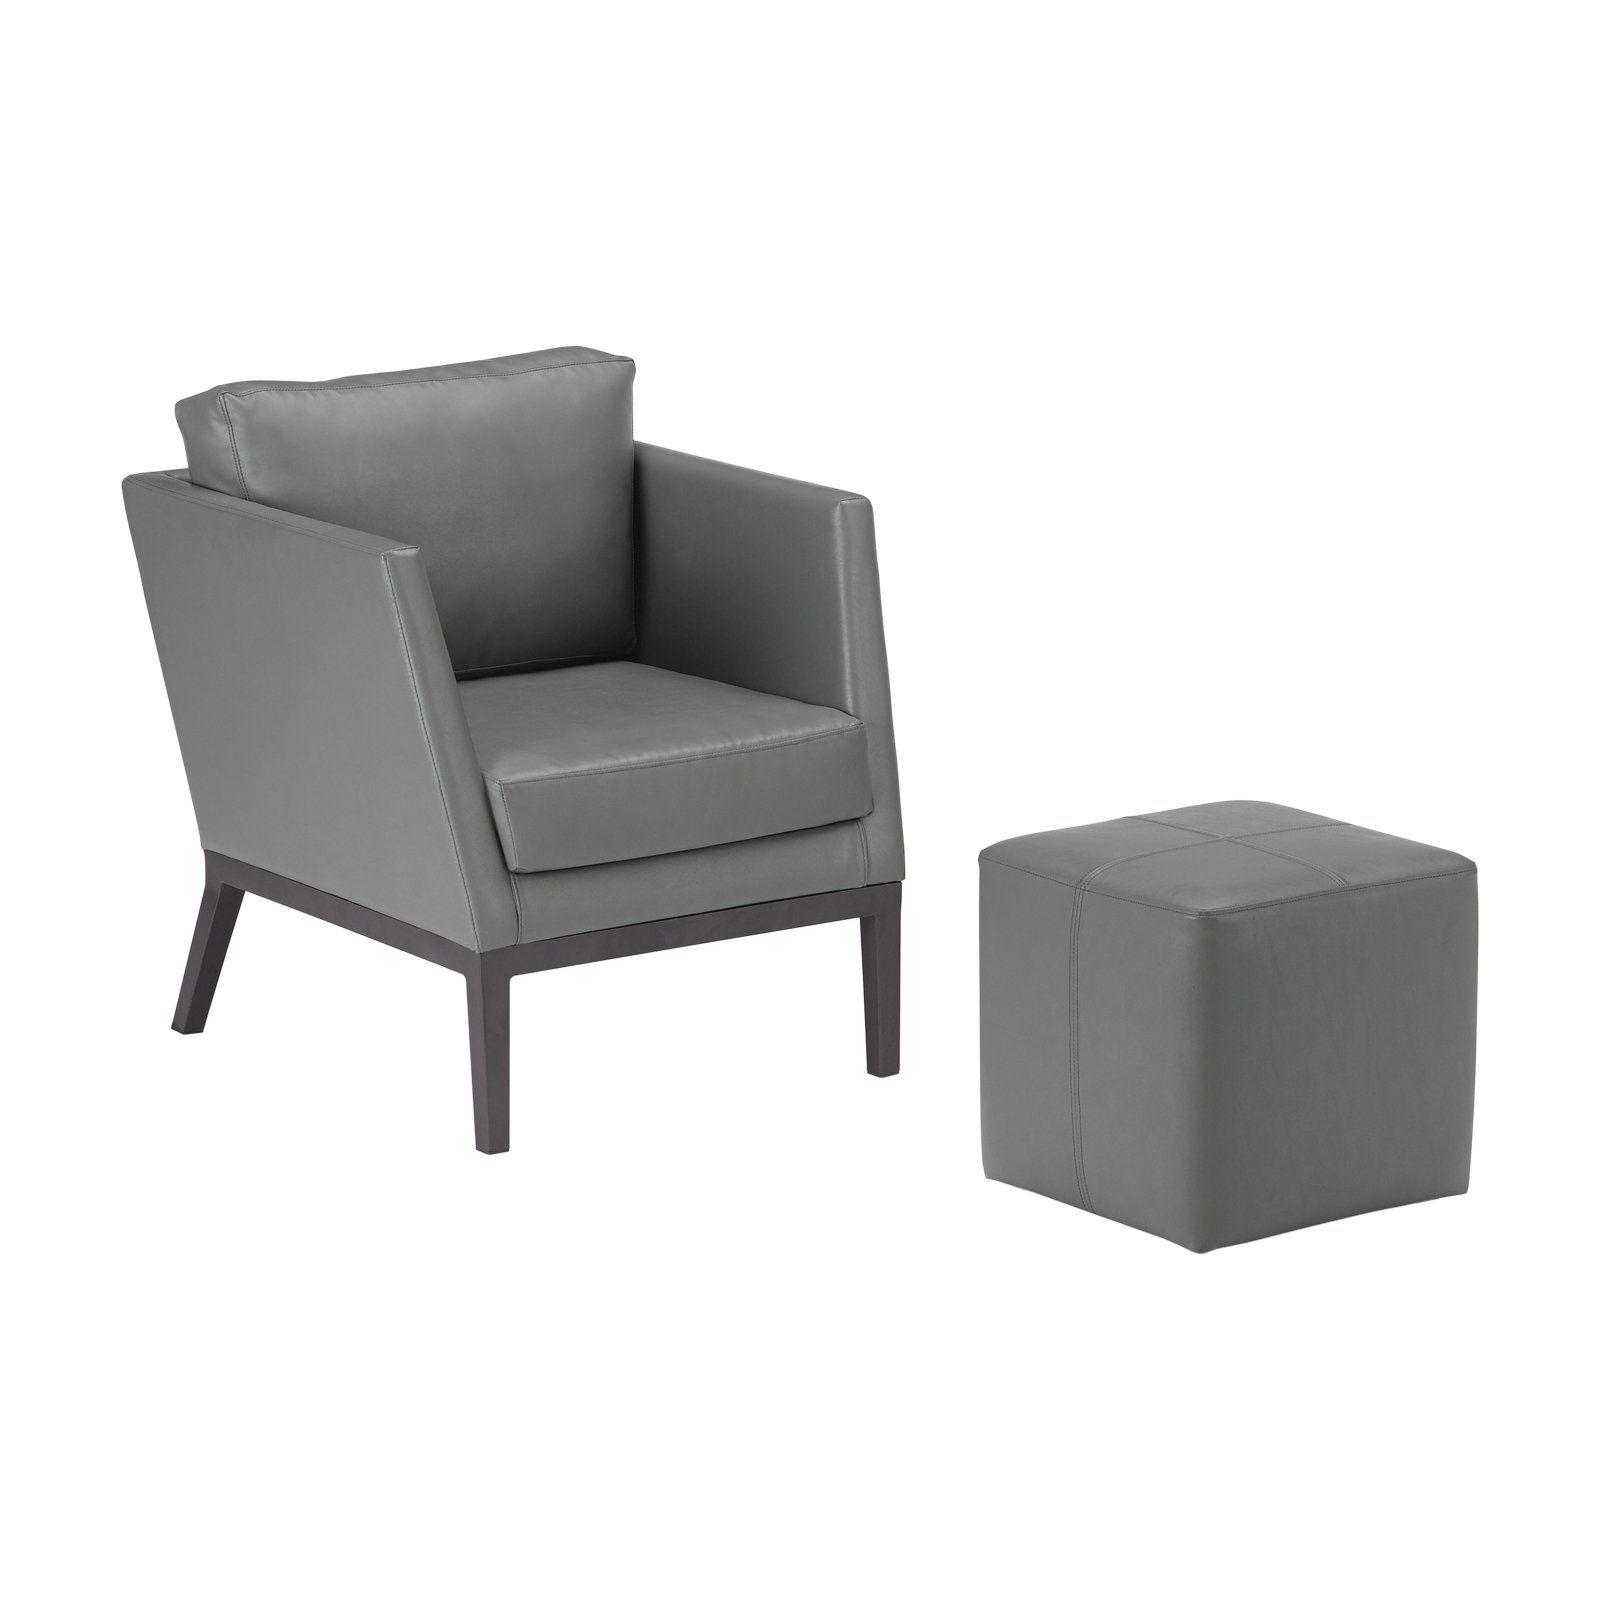 Terrific Oxford Garden Salino Nauticau Faux Leather Outdoor Club Cjindustries Chair Design For Home Cjindustriesco